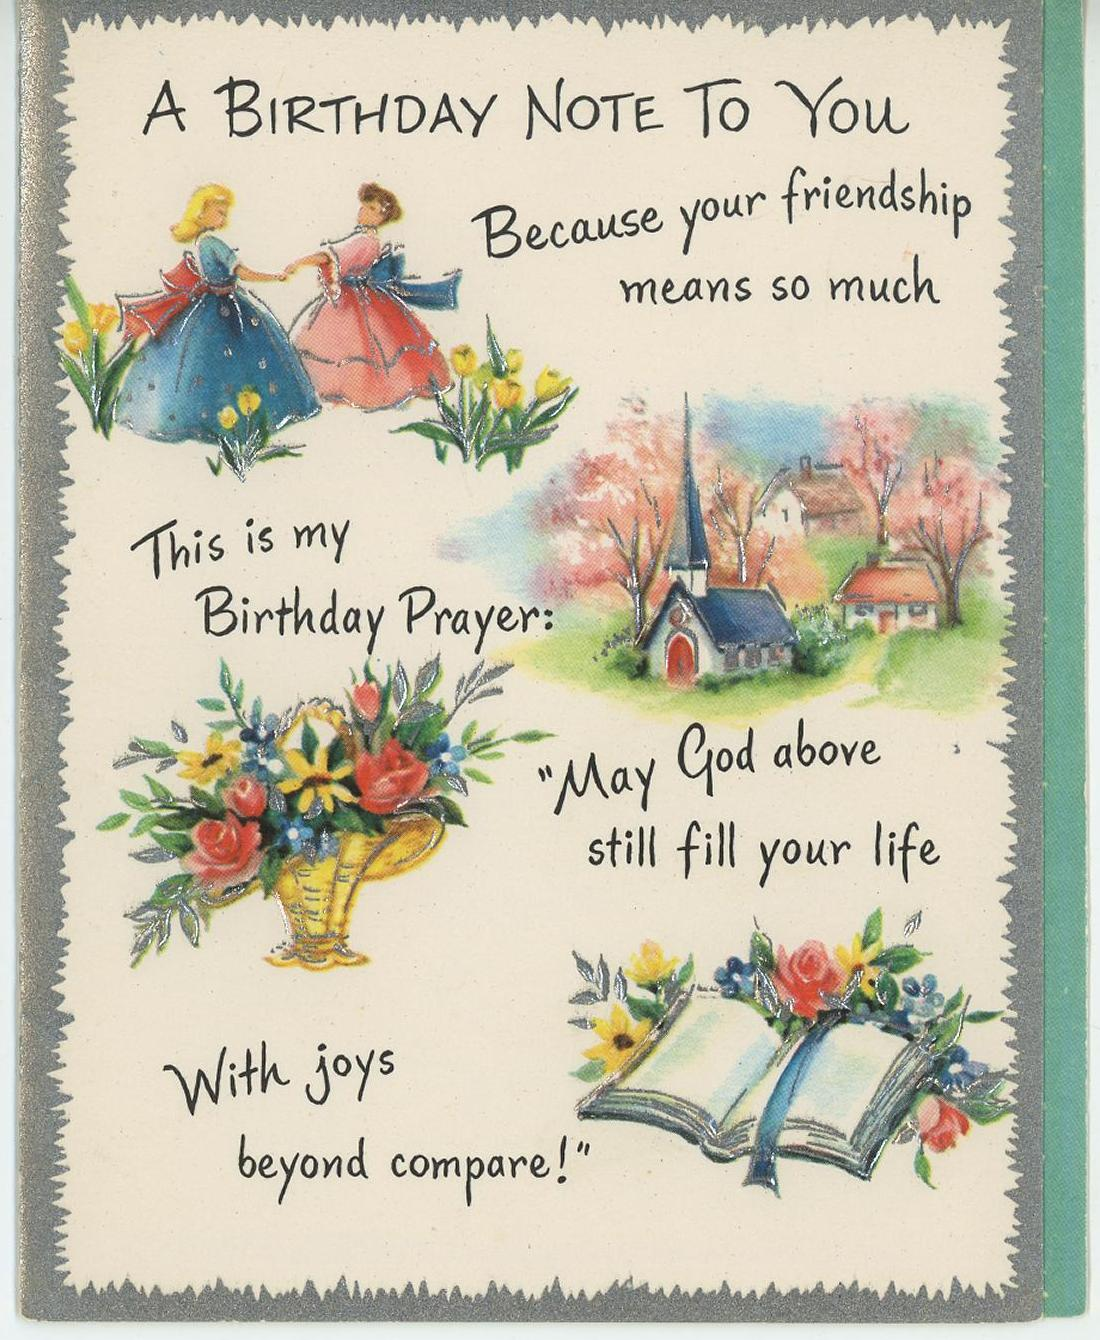 Details About VINTAGE VICTORIAN GIRLS FRIENDS CHURCH GARDEN FLOWERS BIBLE BIRTHDAY CARD PRINT